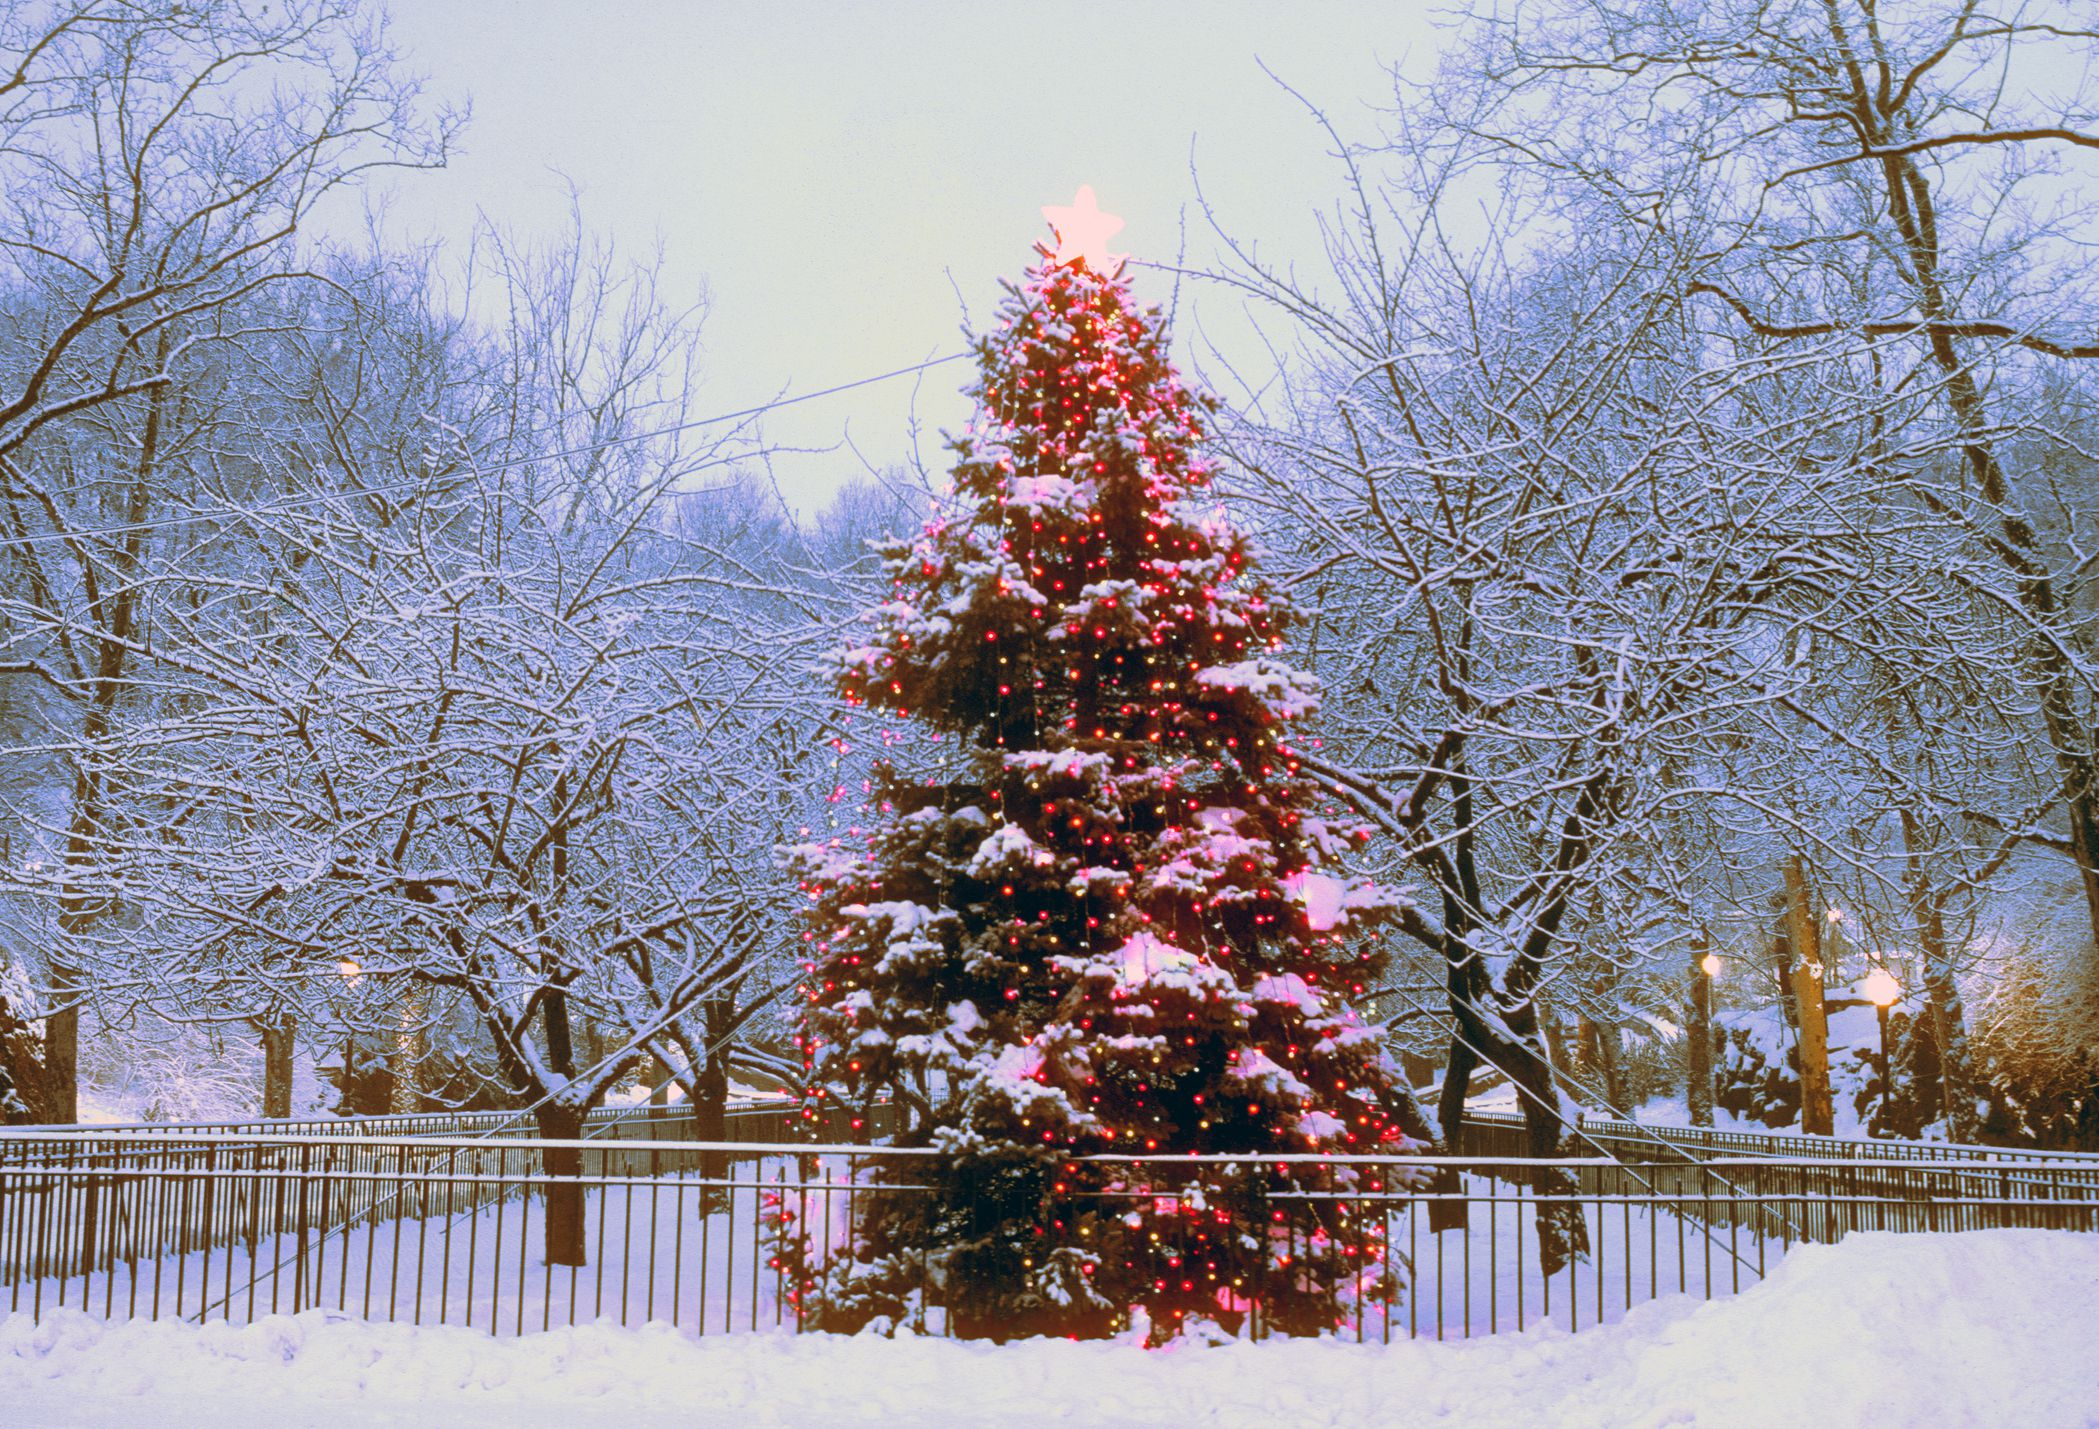 Public Christmas tree in Carl Schurz Park, NYC.